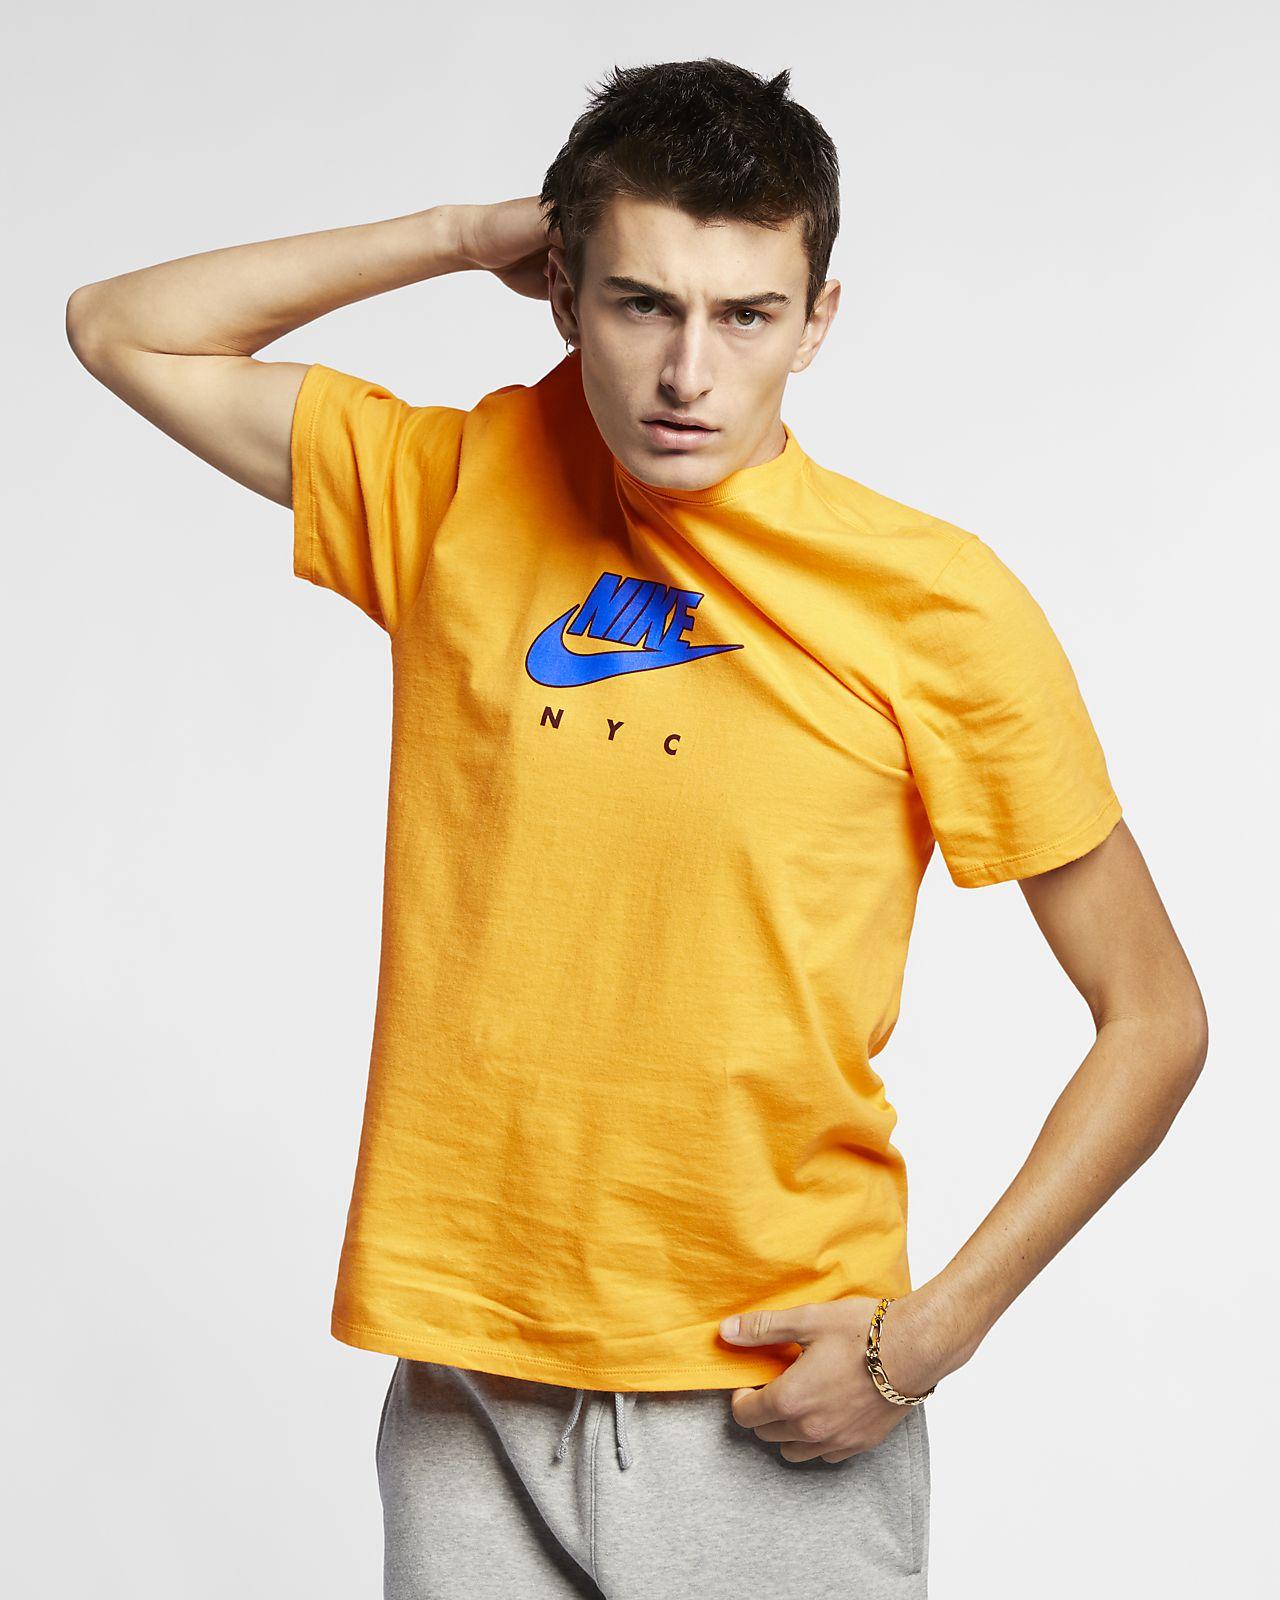 23df43c410a4c4 Nike Sportswear (New York City) Men s T-Shirt. Nike.com